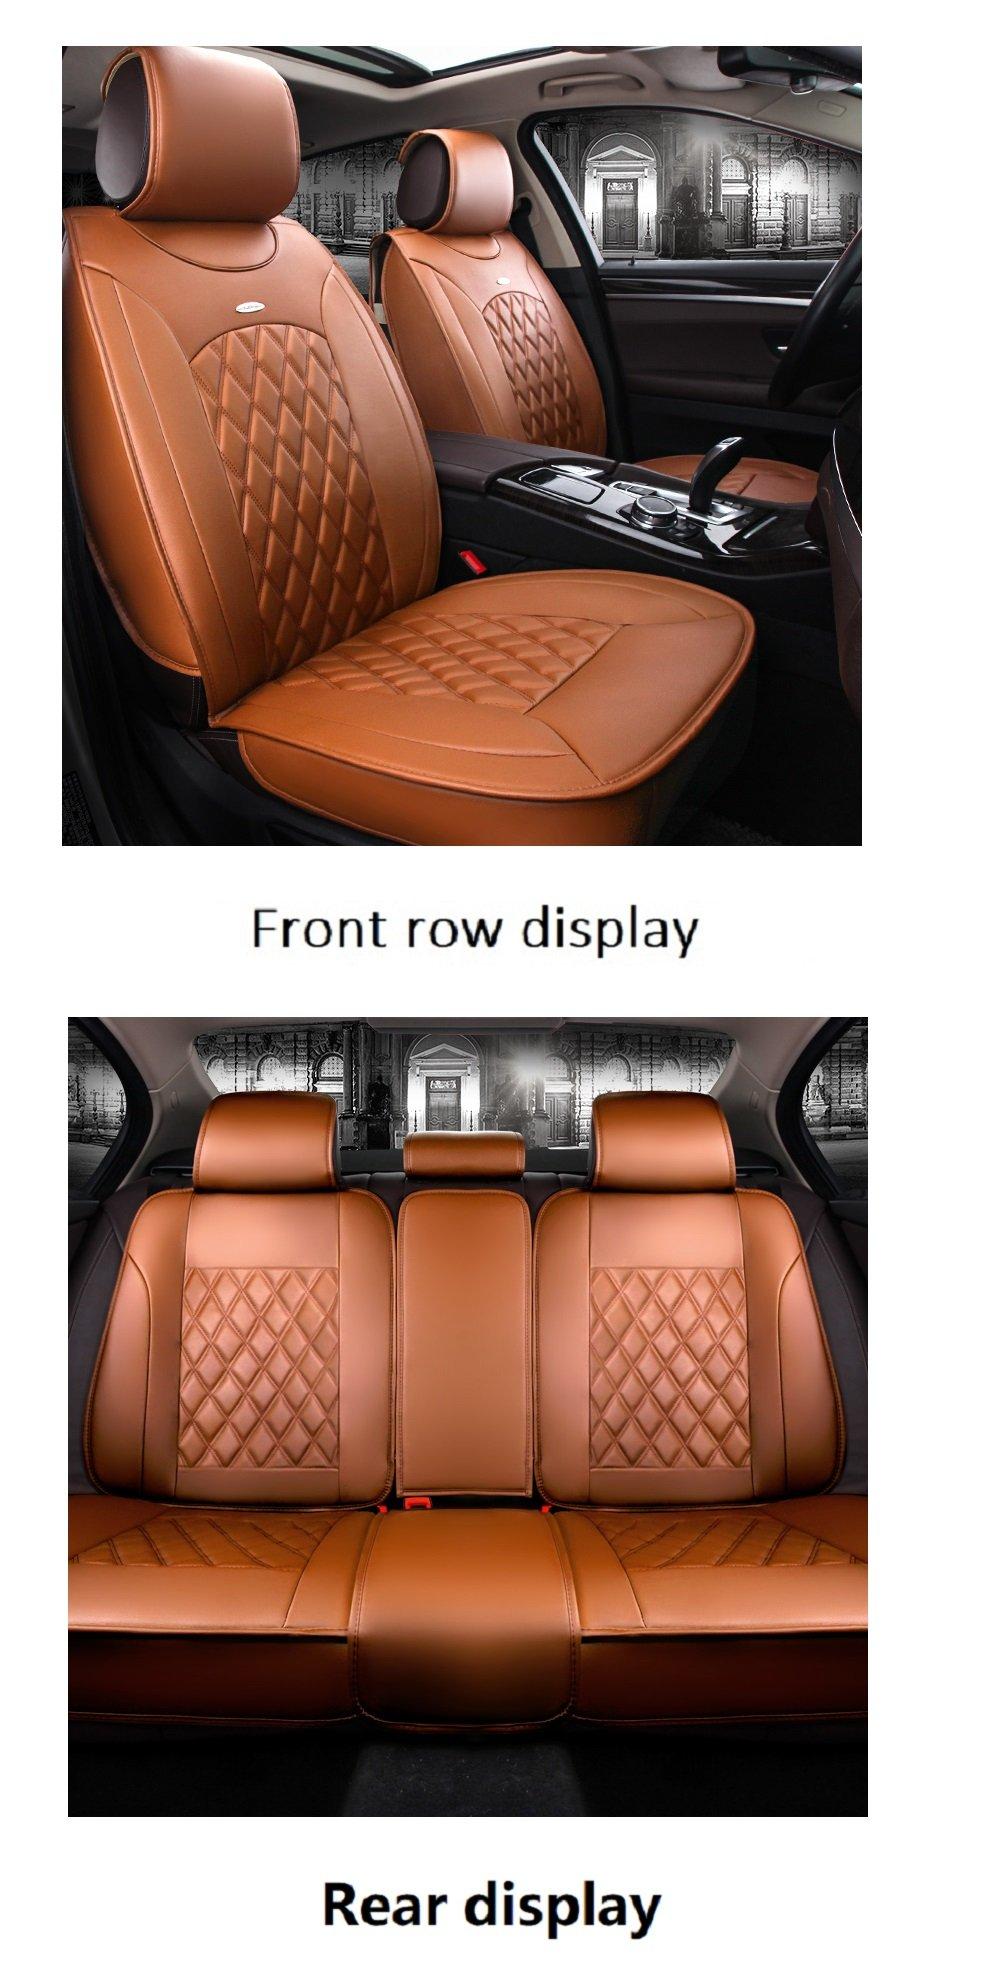 JOJOHON Luxury PU Leather Auto Car Seat Covers 5 Seats Full Set Universal Fit (Orange)